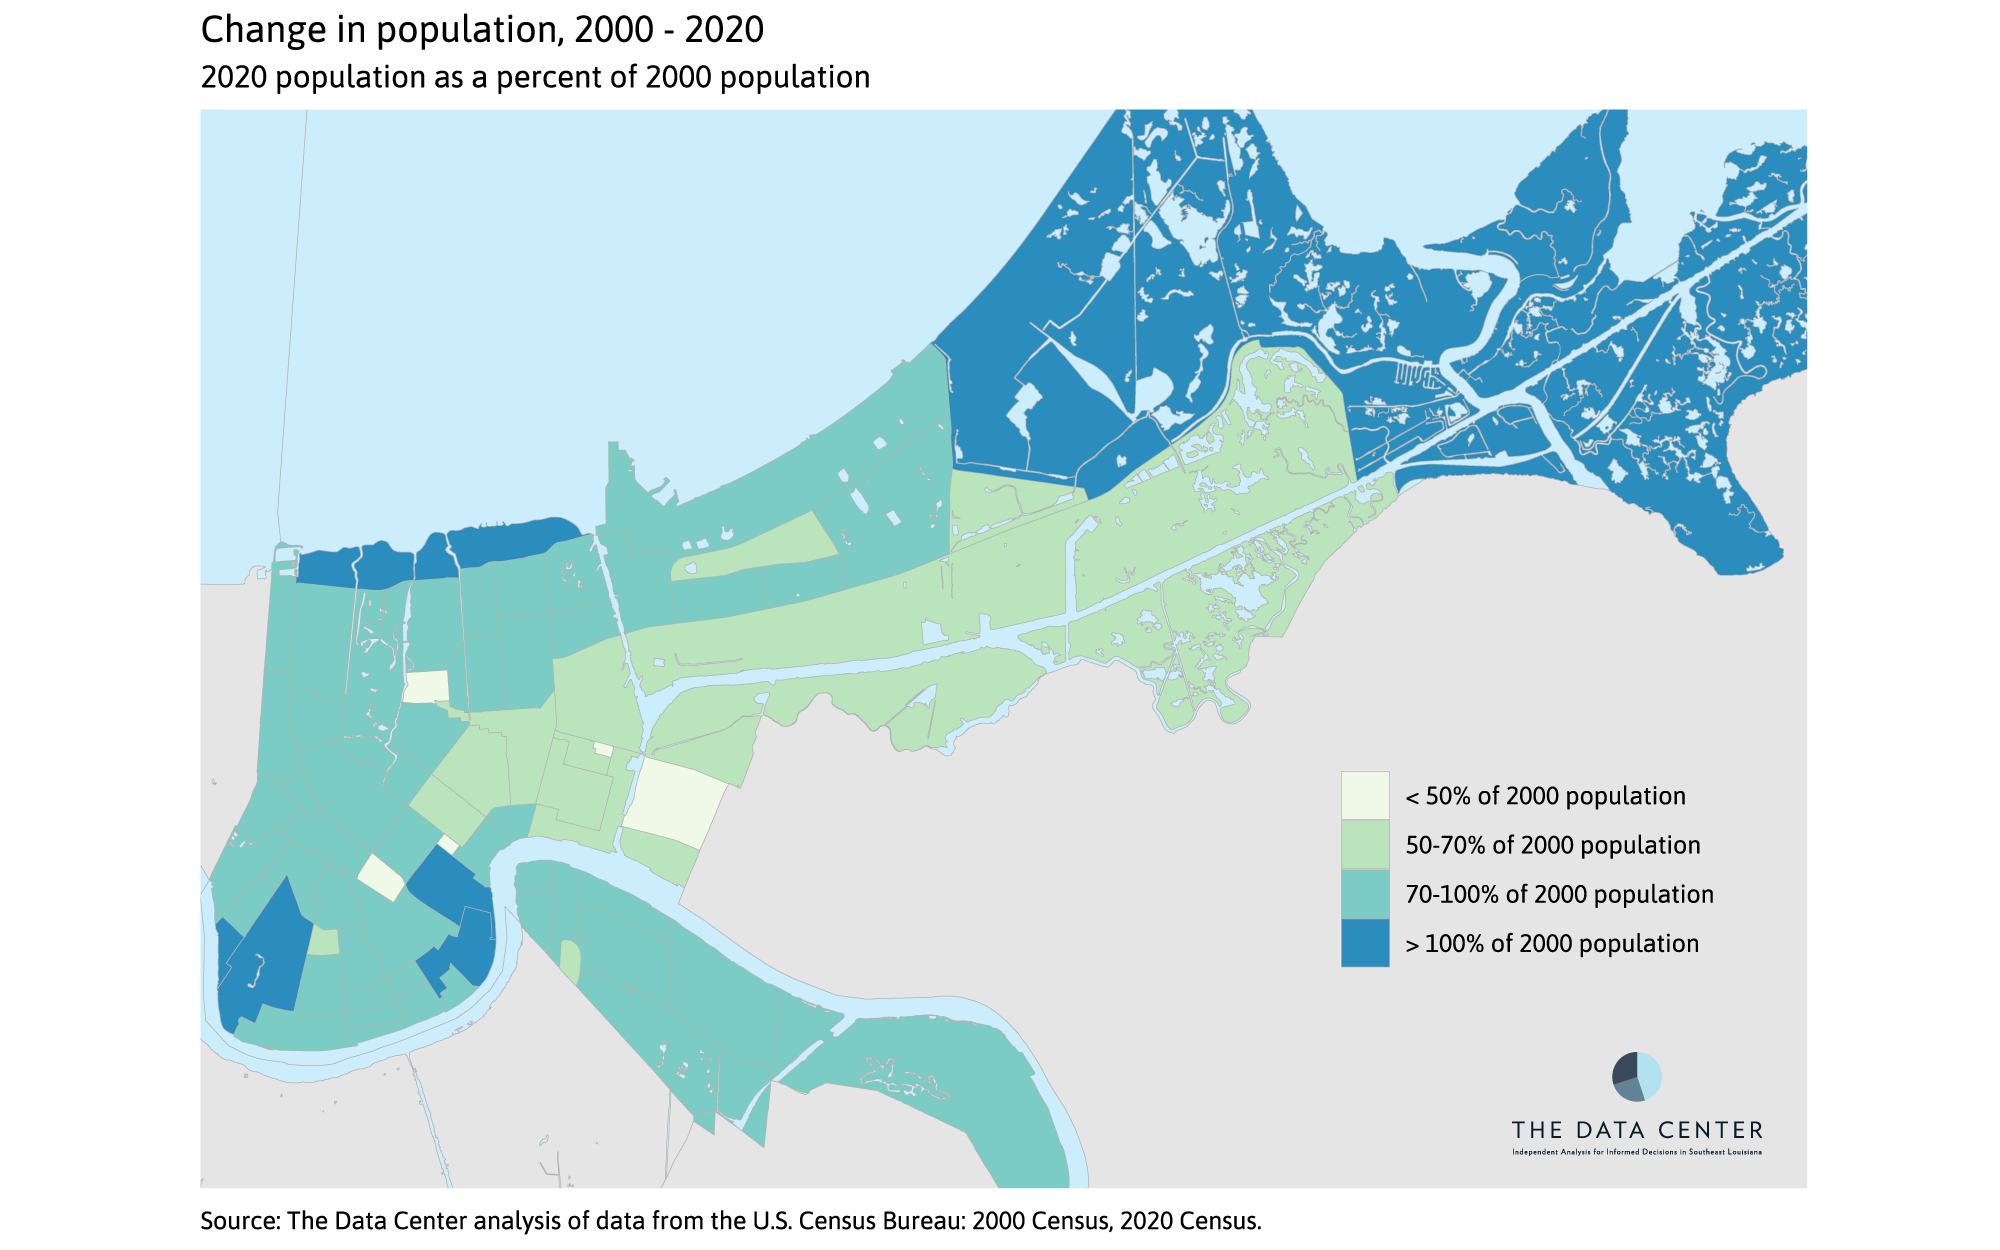 Percent Change, 2000 to 2020